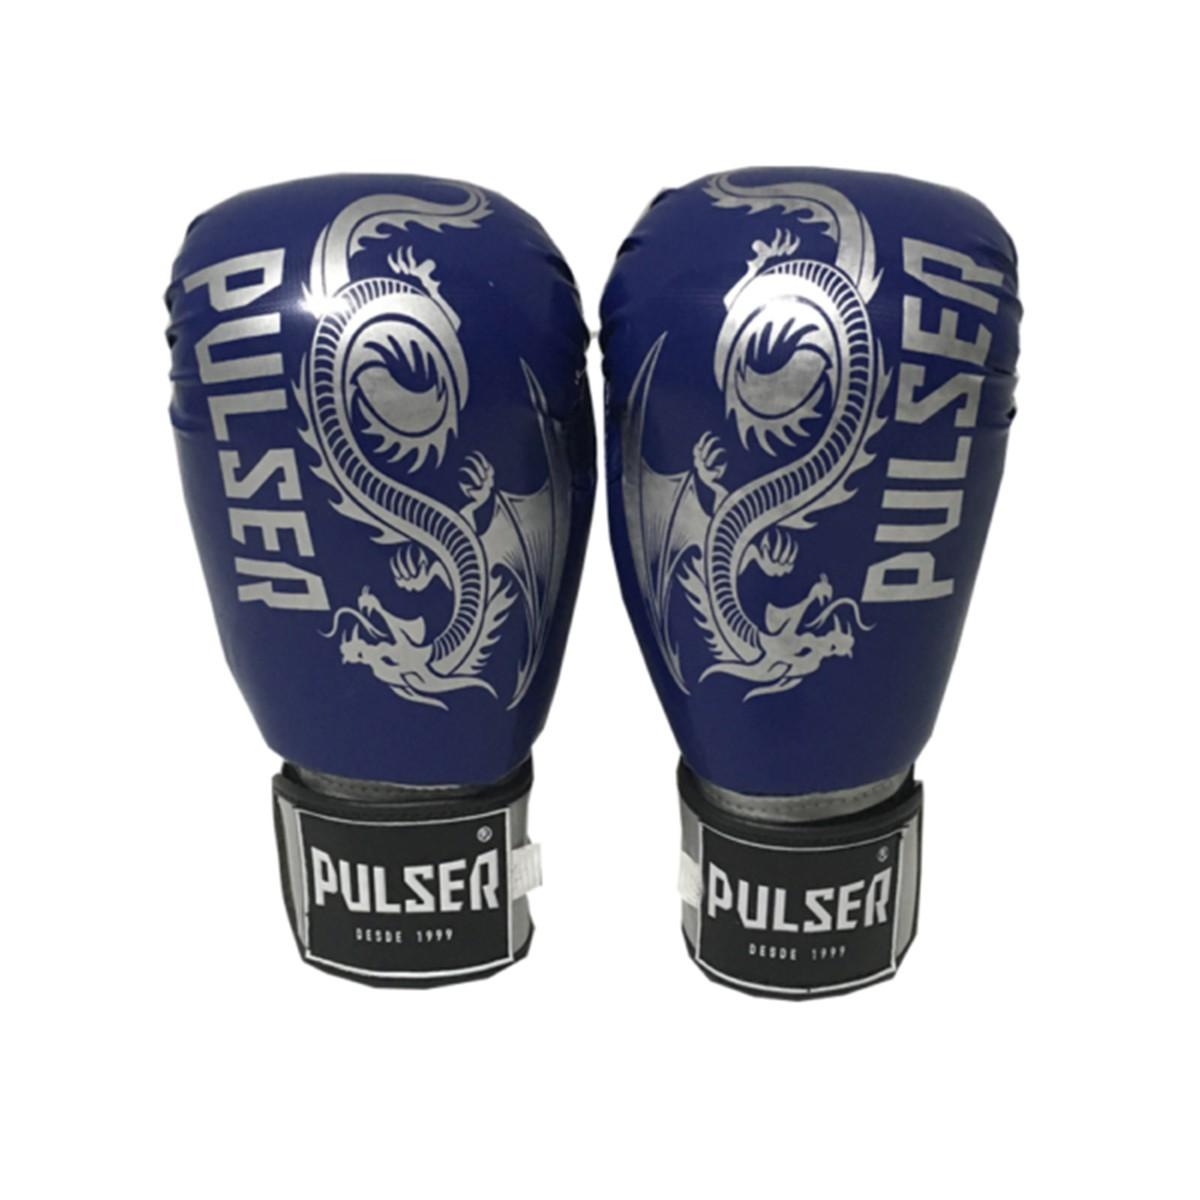 Kit de Muay Thai / Kickboxing 10oz - Azul Escuro Dragão - Pulser  - PRALUTA SHOP